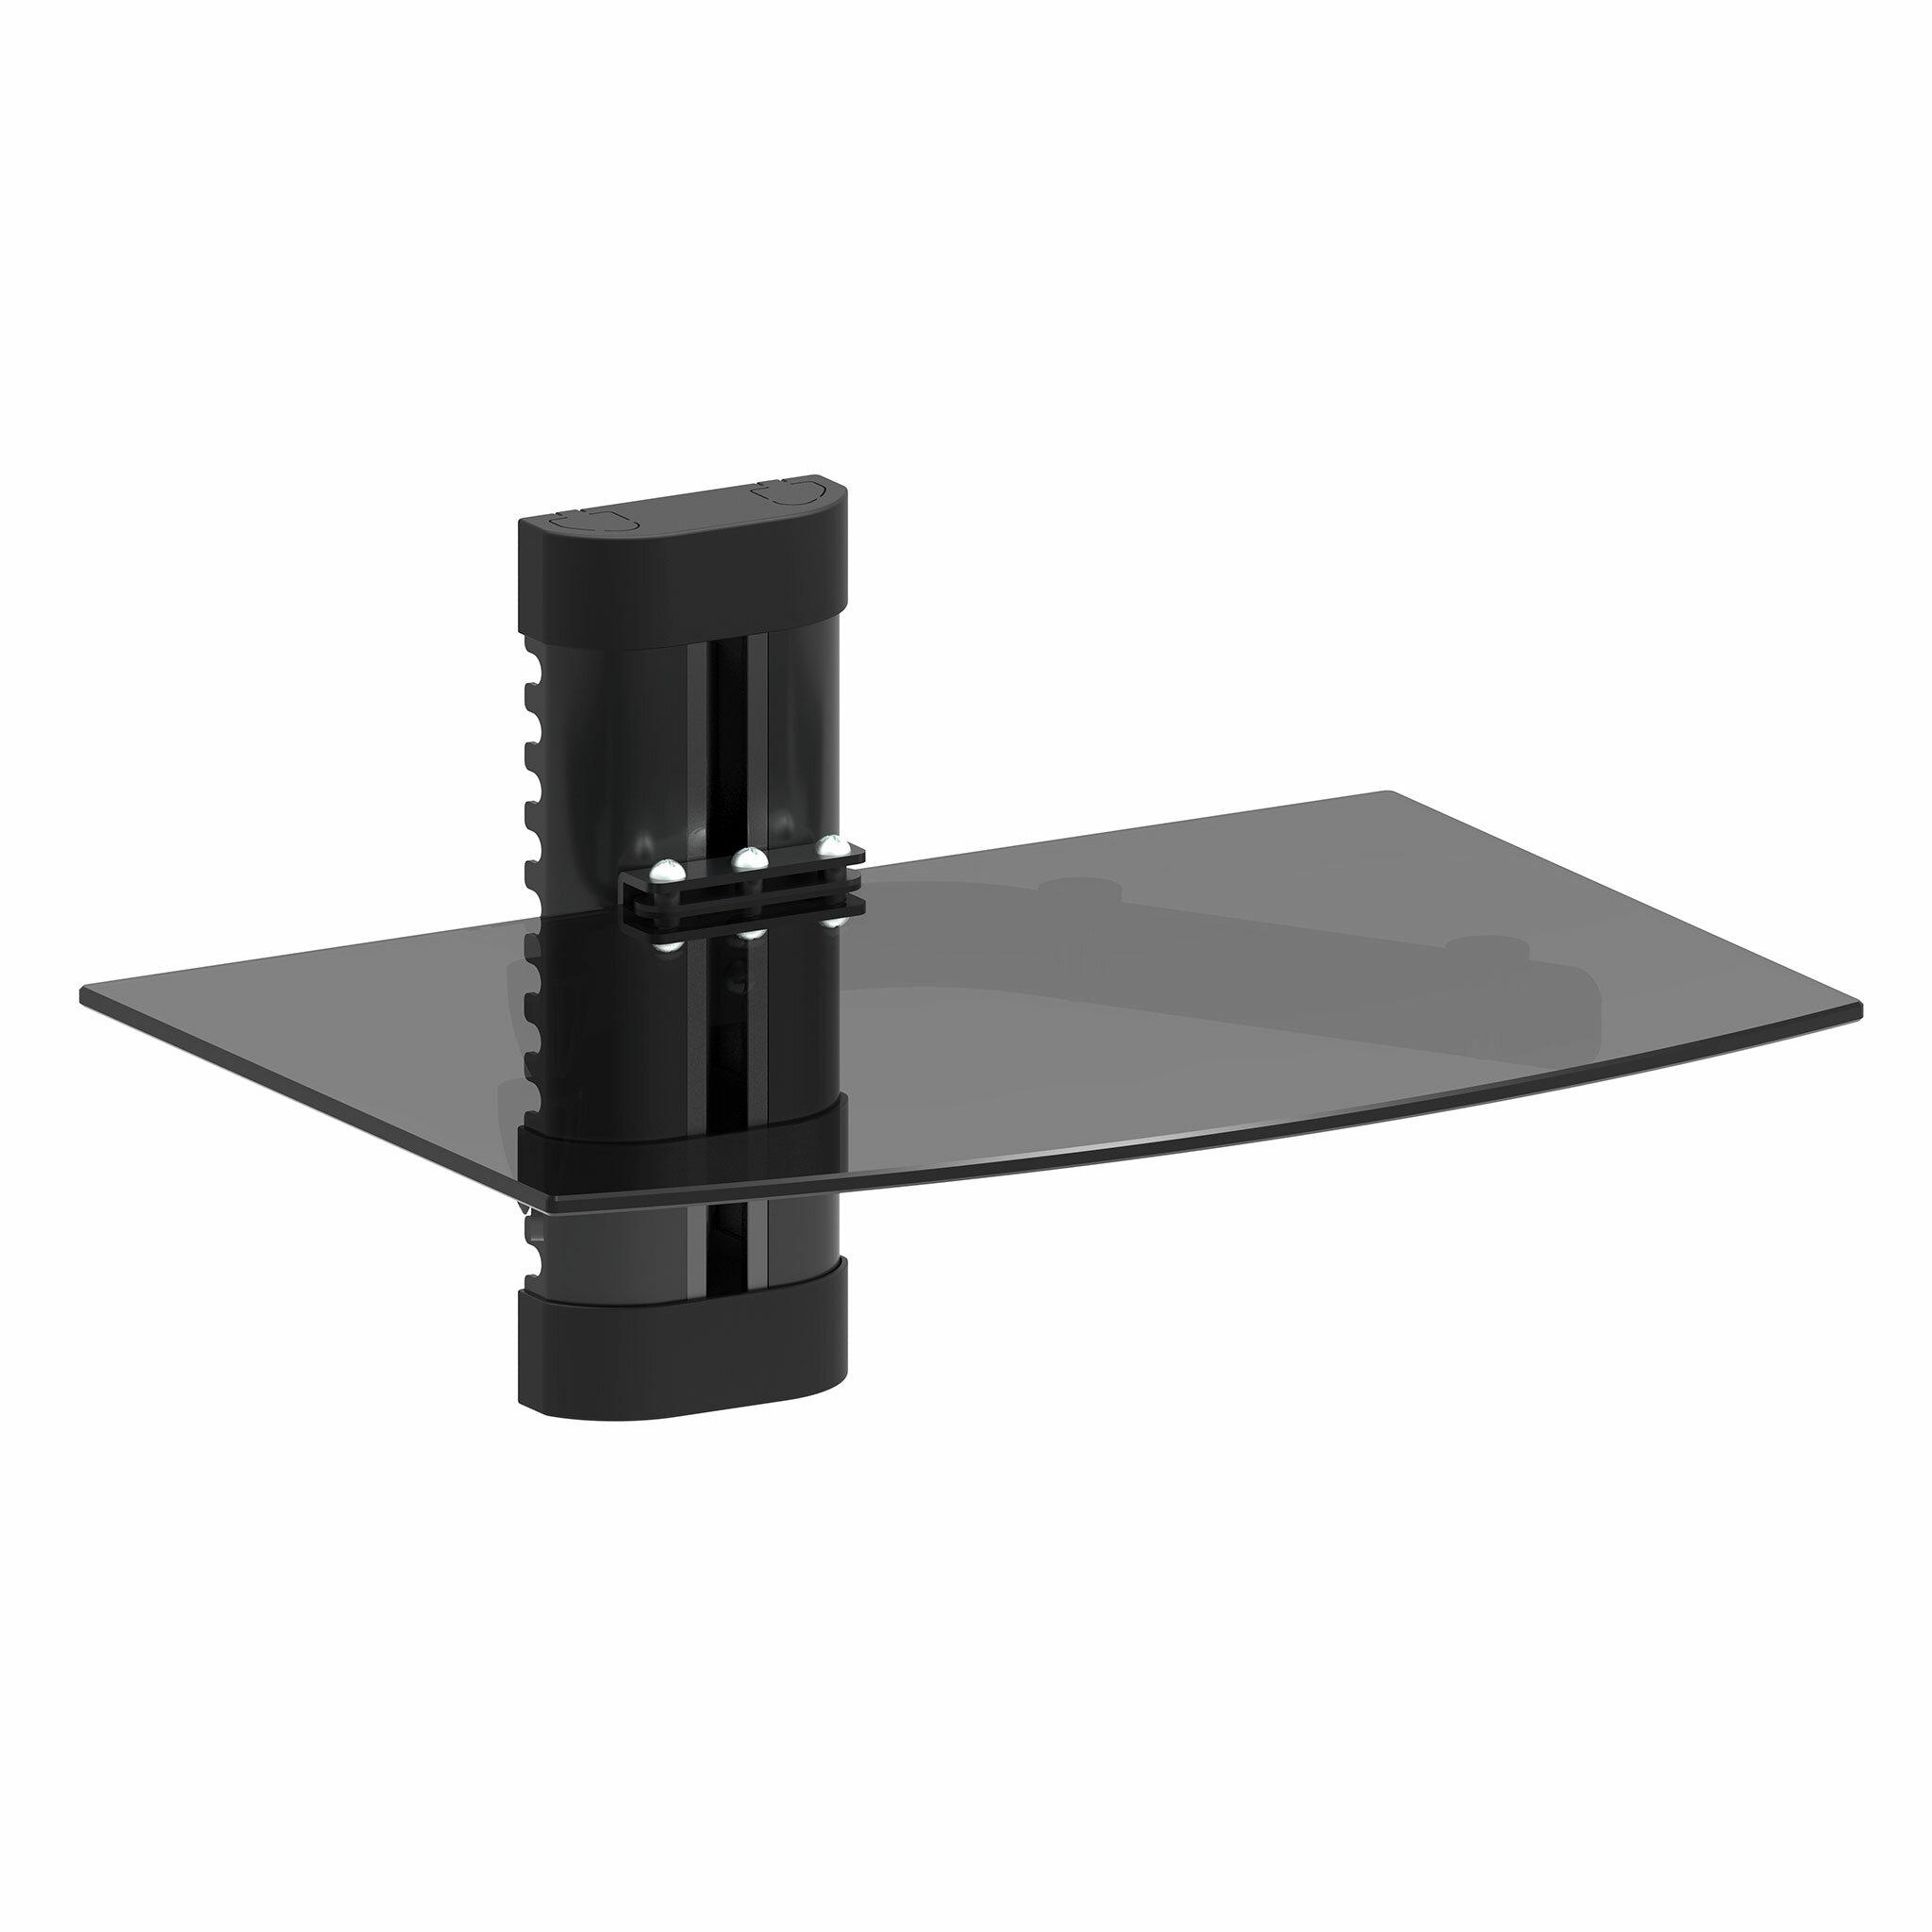 Promounts On Wall Av Component With Single Shelf Reviews